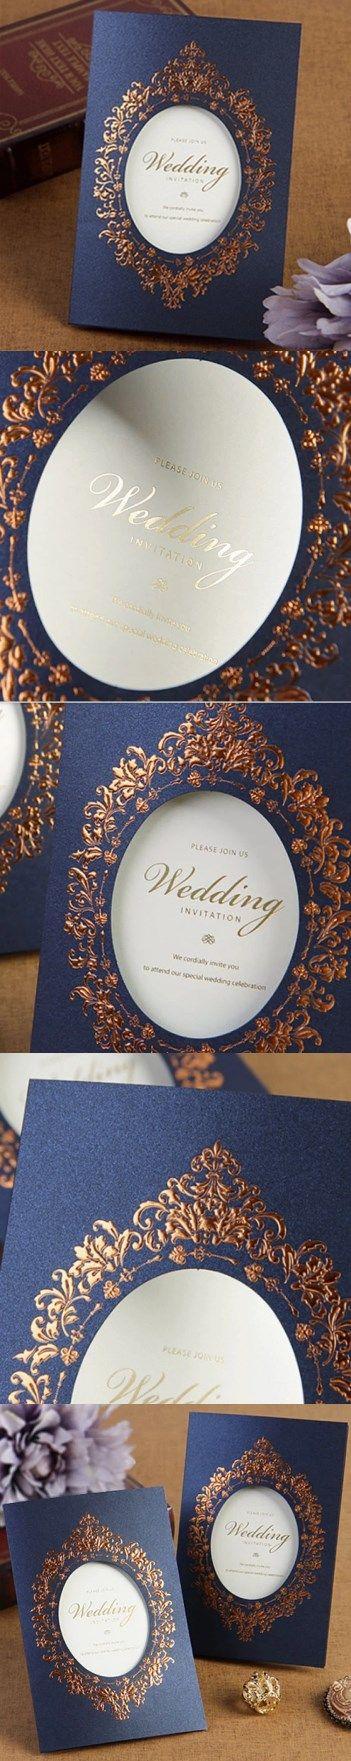 Royal dark blue embossed invitations cards for wedding VC0054DB